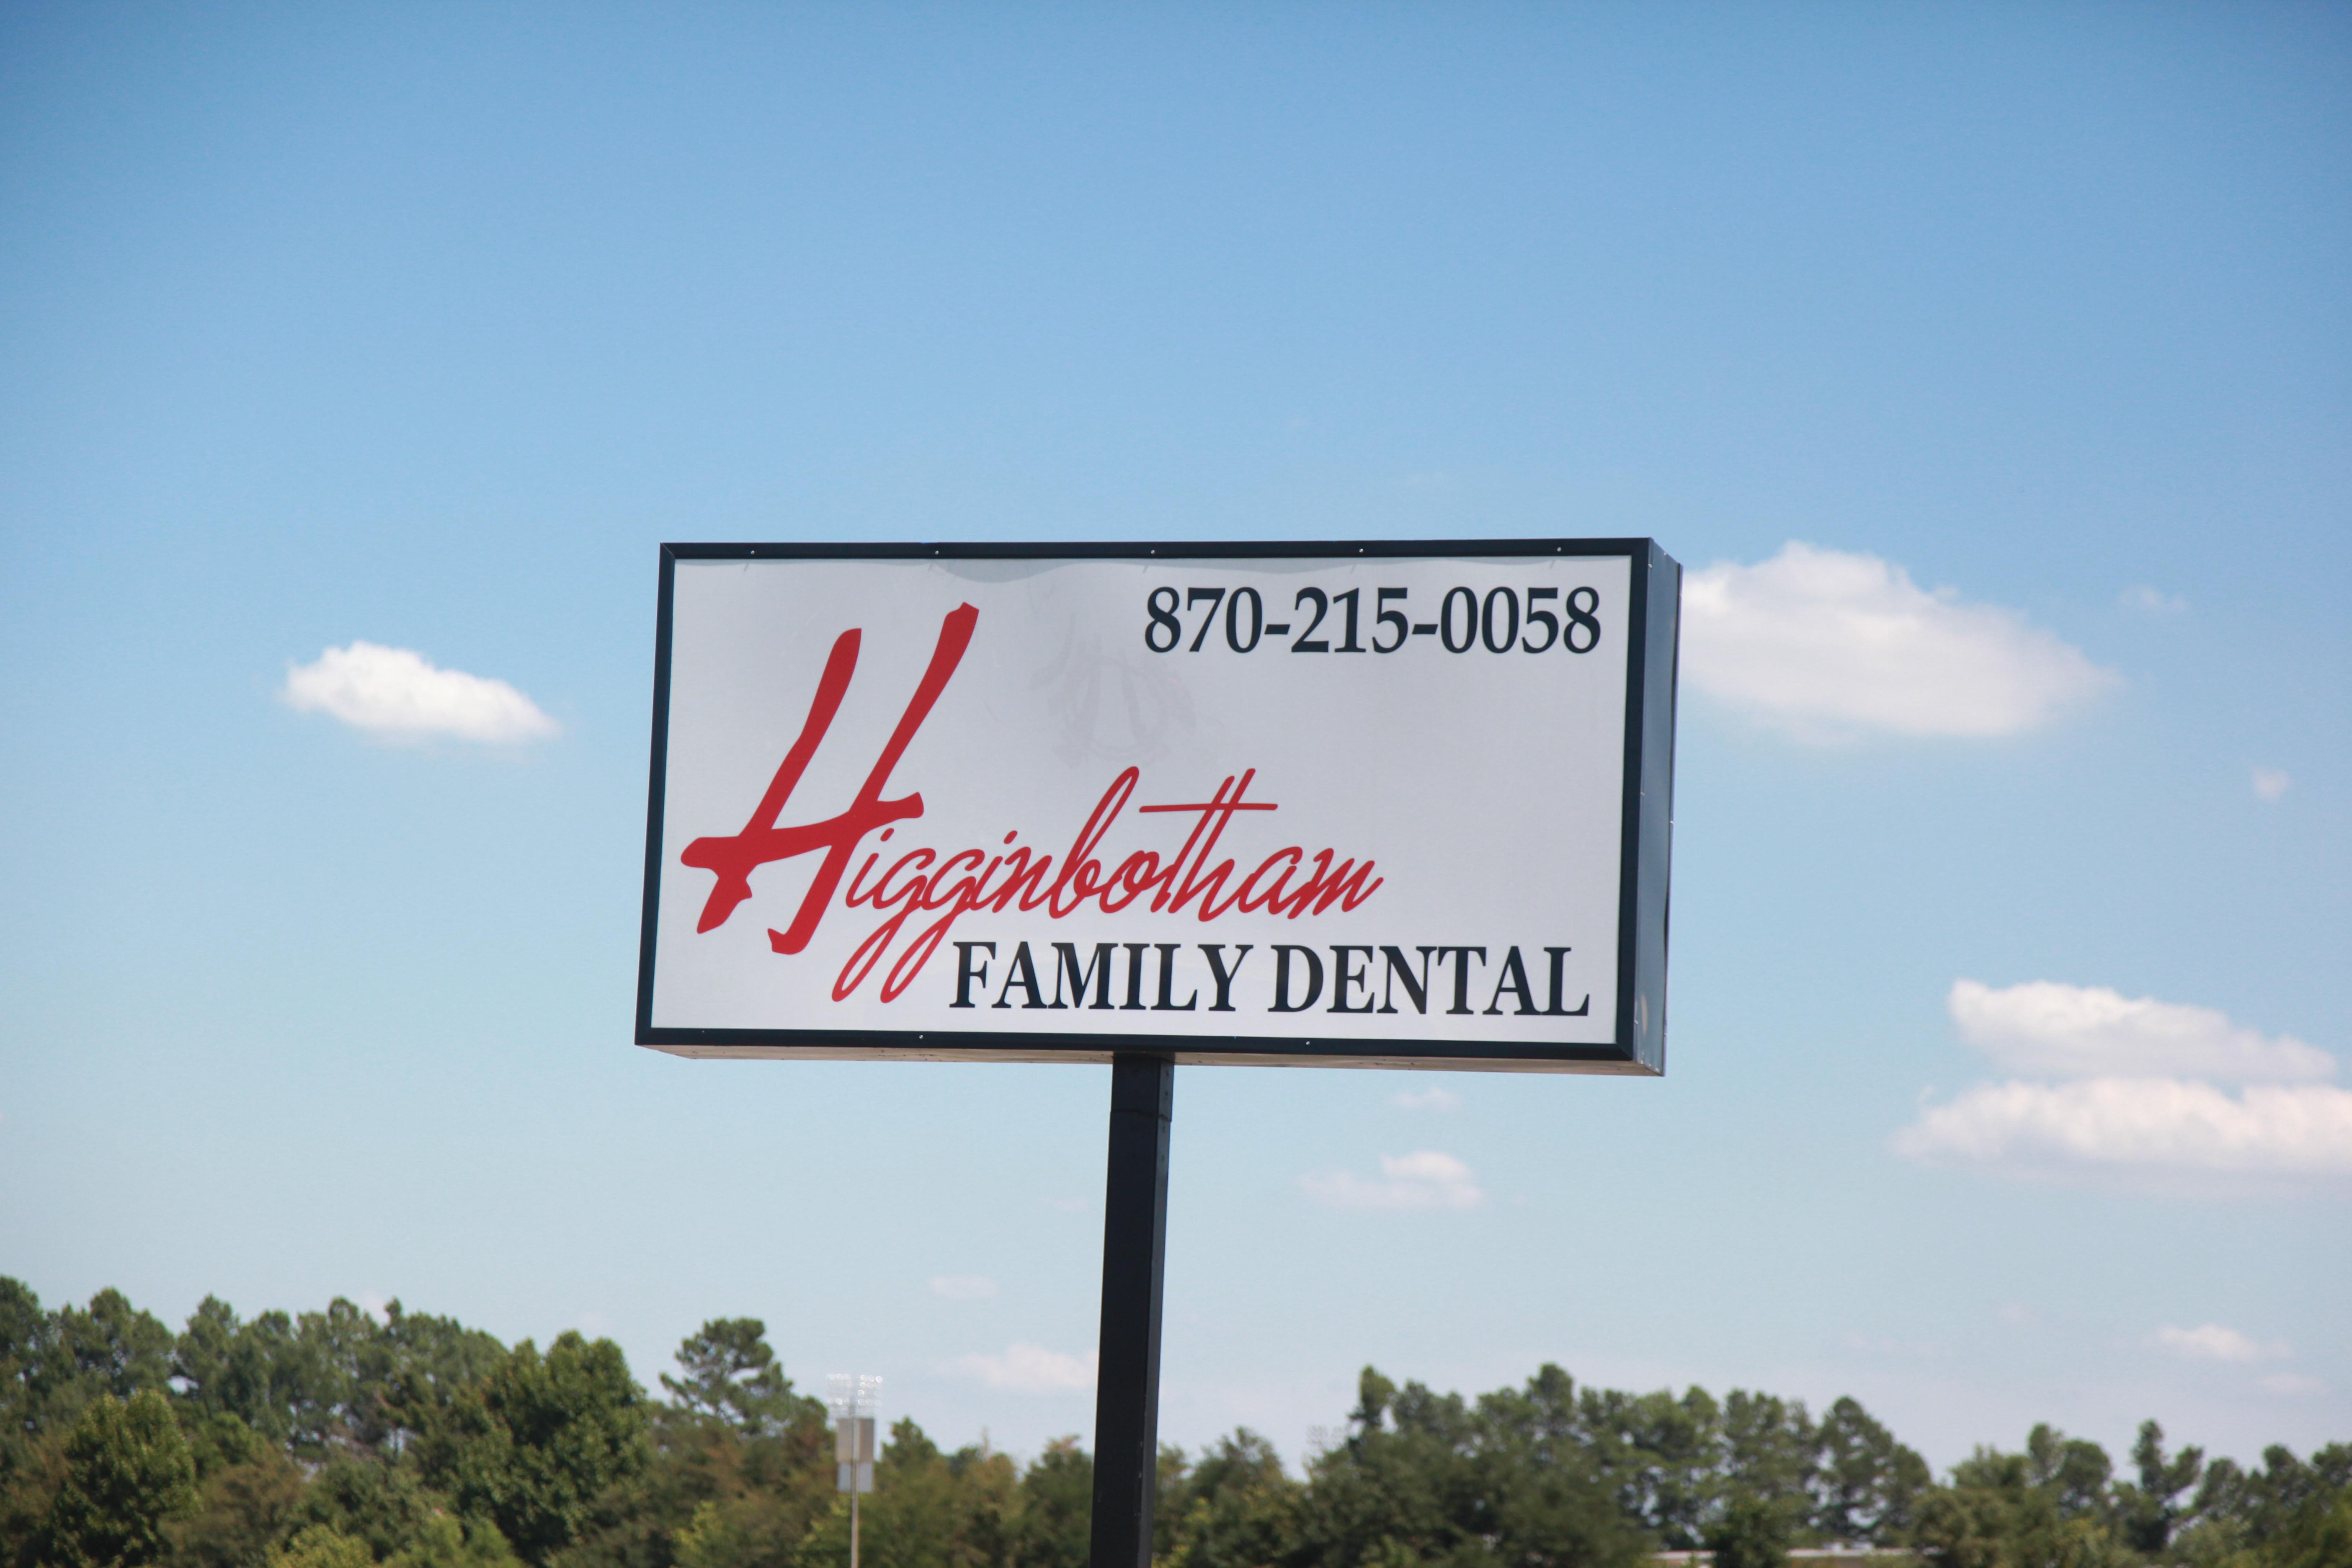 Higginbotham Family Dental